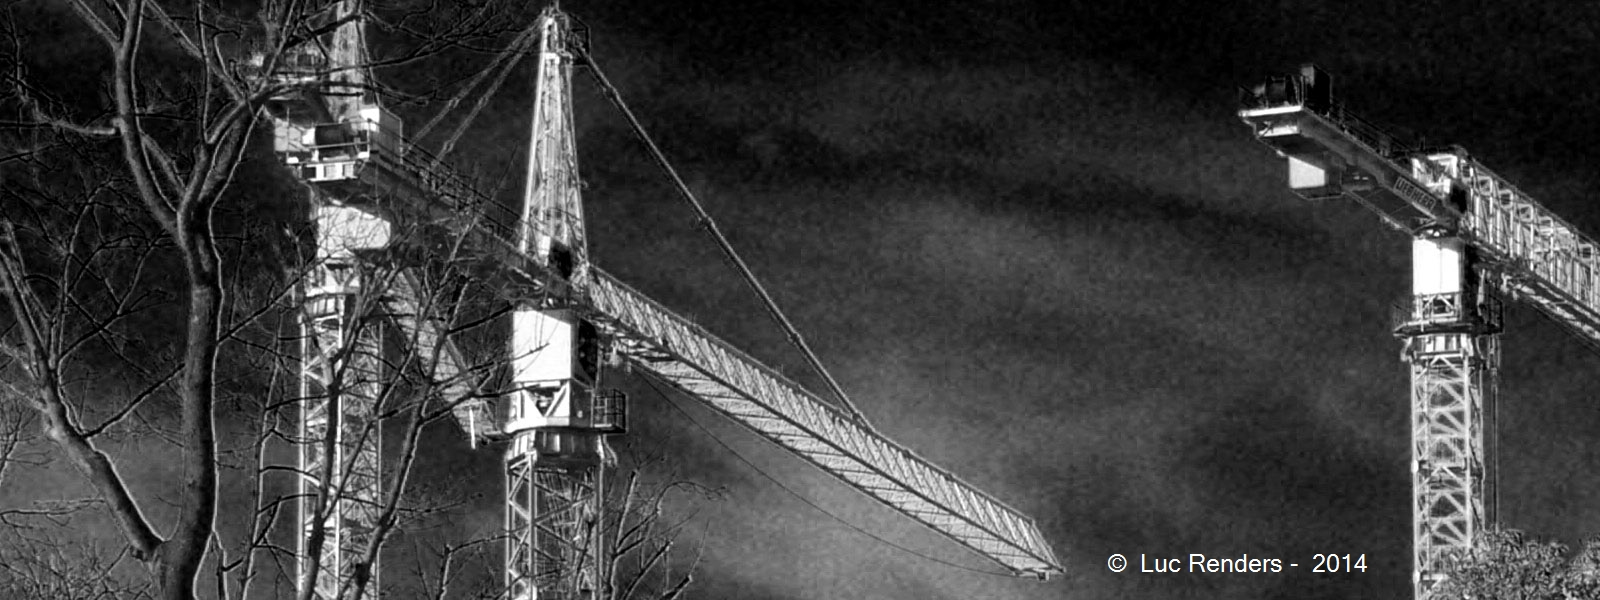 Luc Renders 2016 - Trees against towers